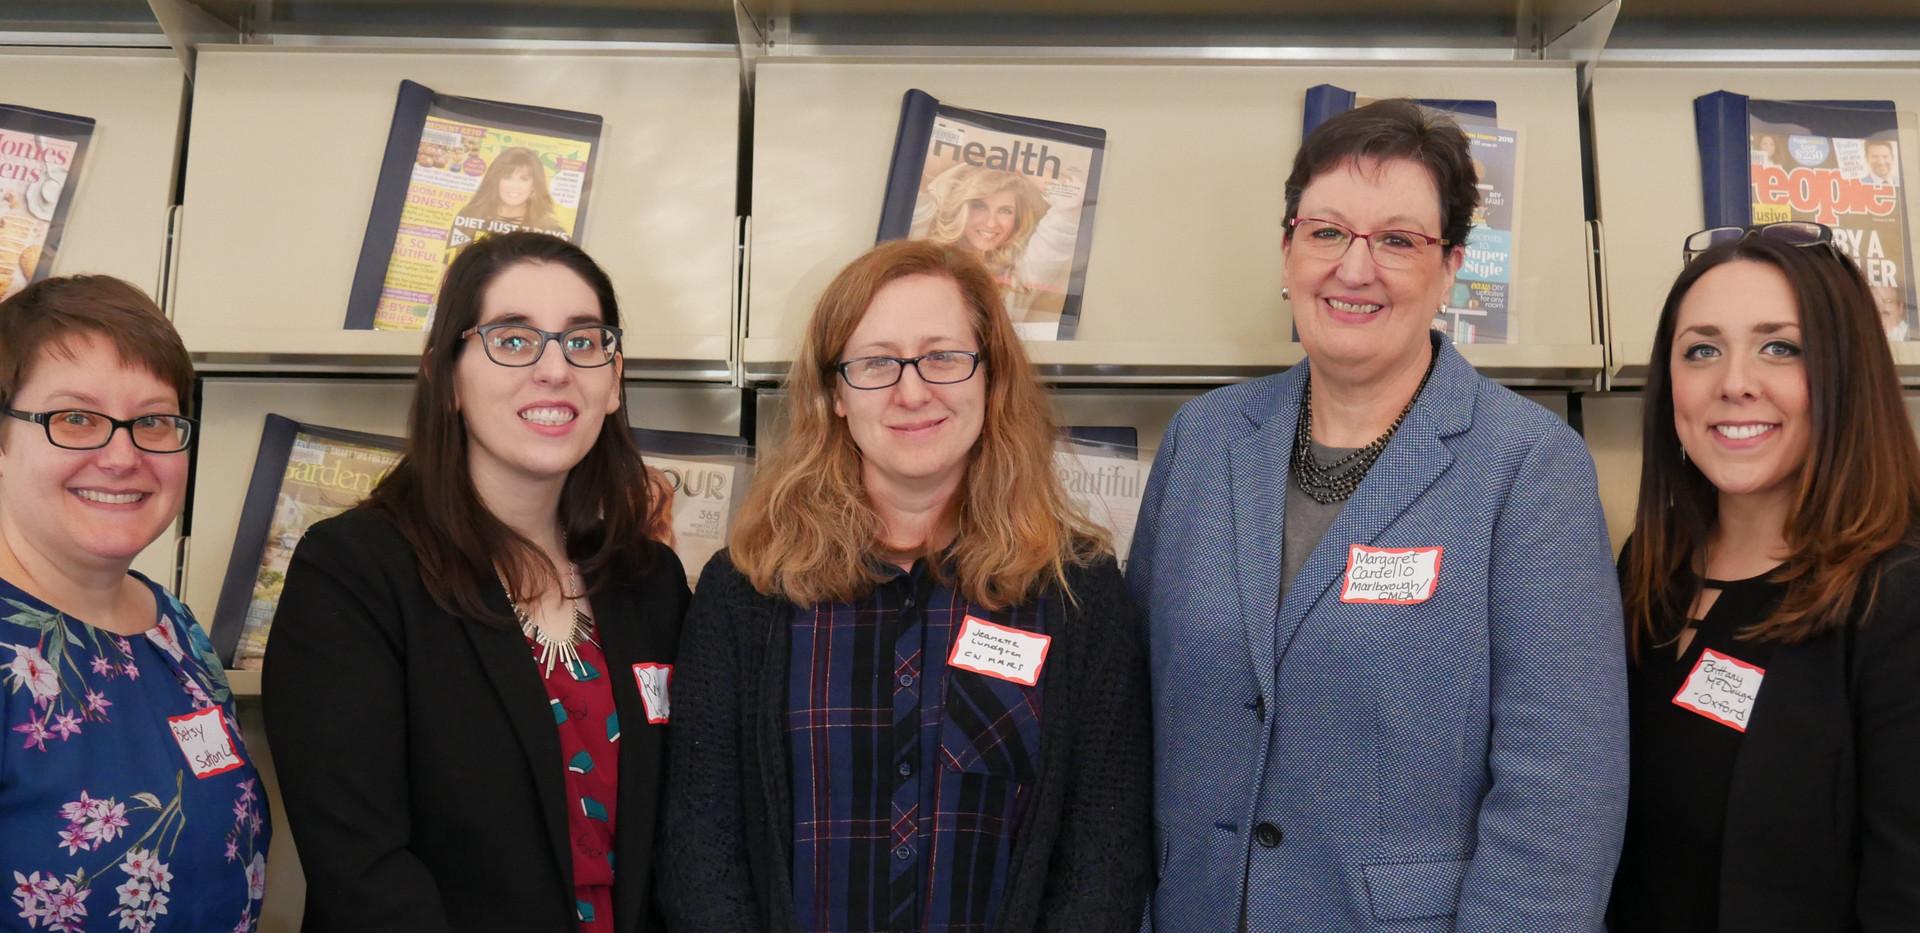 Legislative Breakfast  Millbury Public Library, Millbury, MA  February 1, 2019